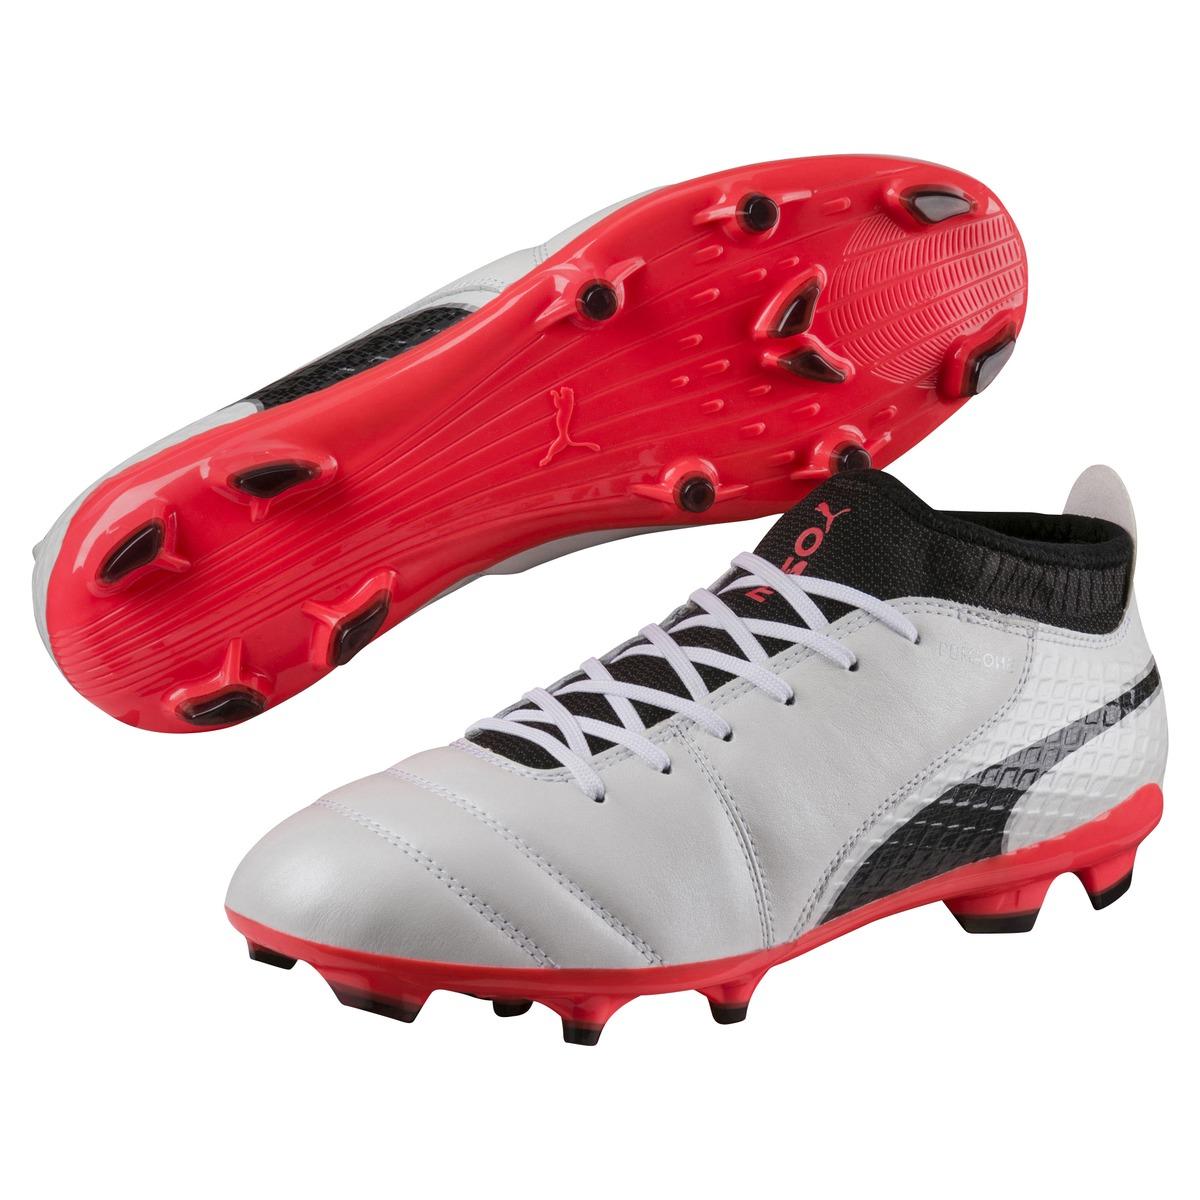 huge discount 9514c 8a230 puma one 17.2 fg q3 17 fotbollssko senior fotbollsskor